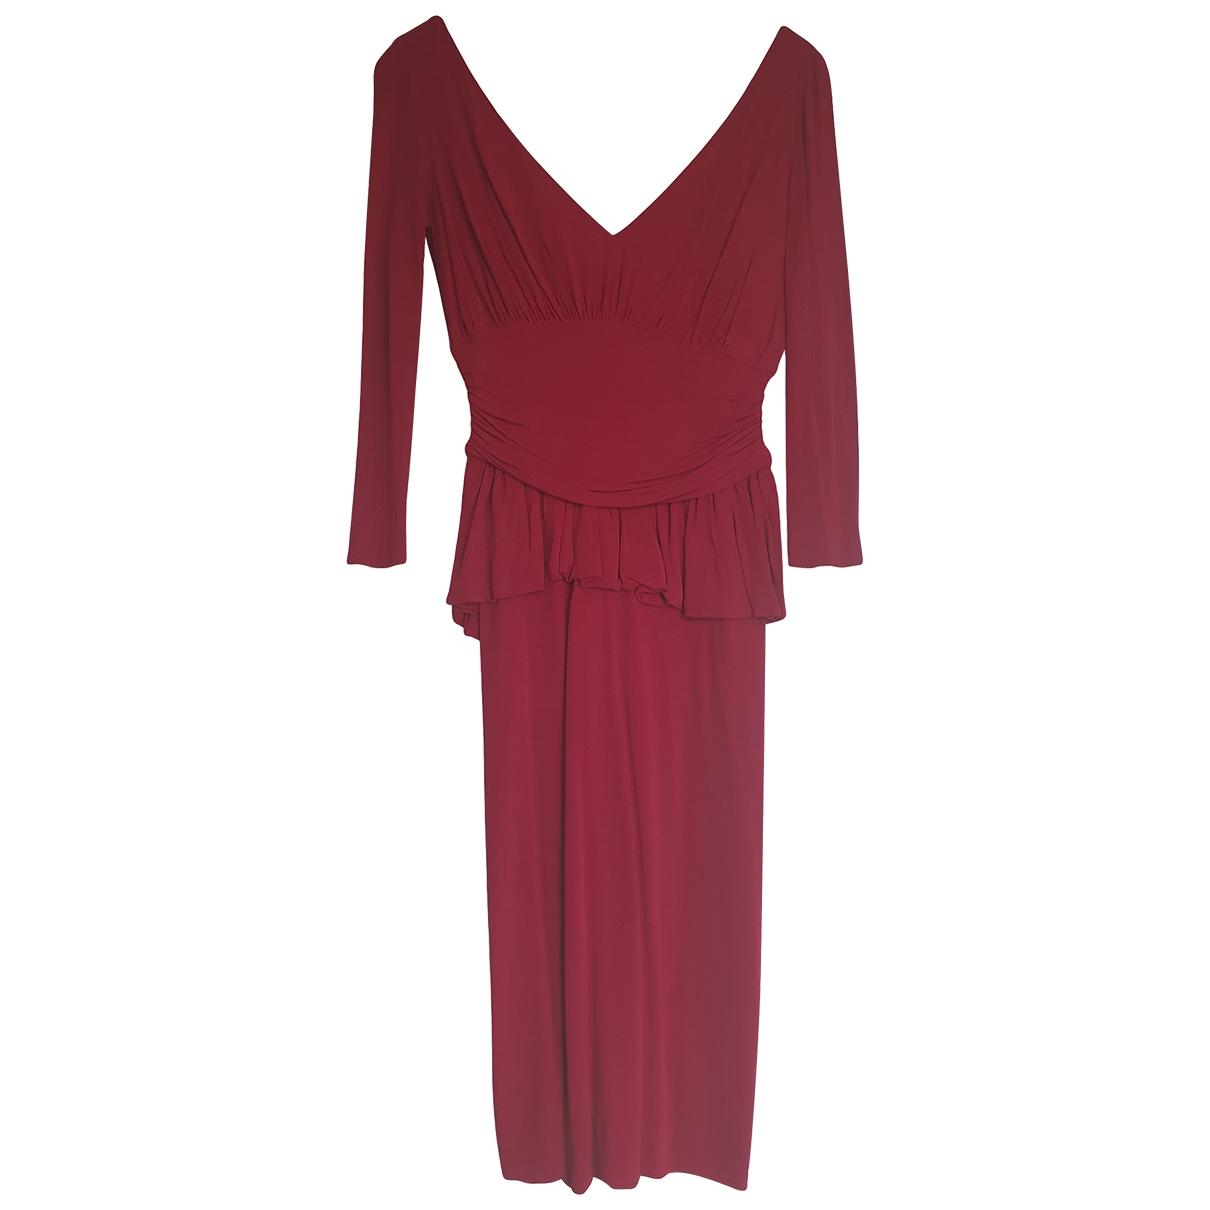 Alexander Mcqueen \N Red dress for Women 40 IT